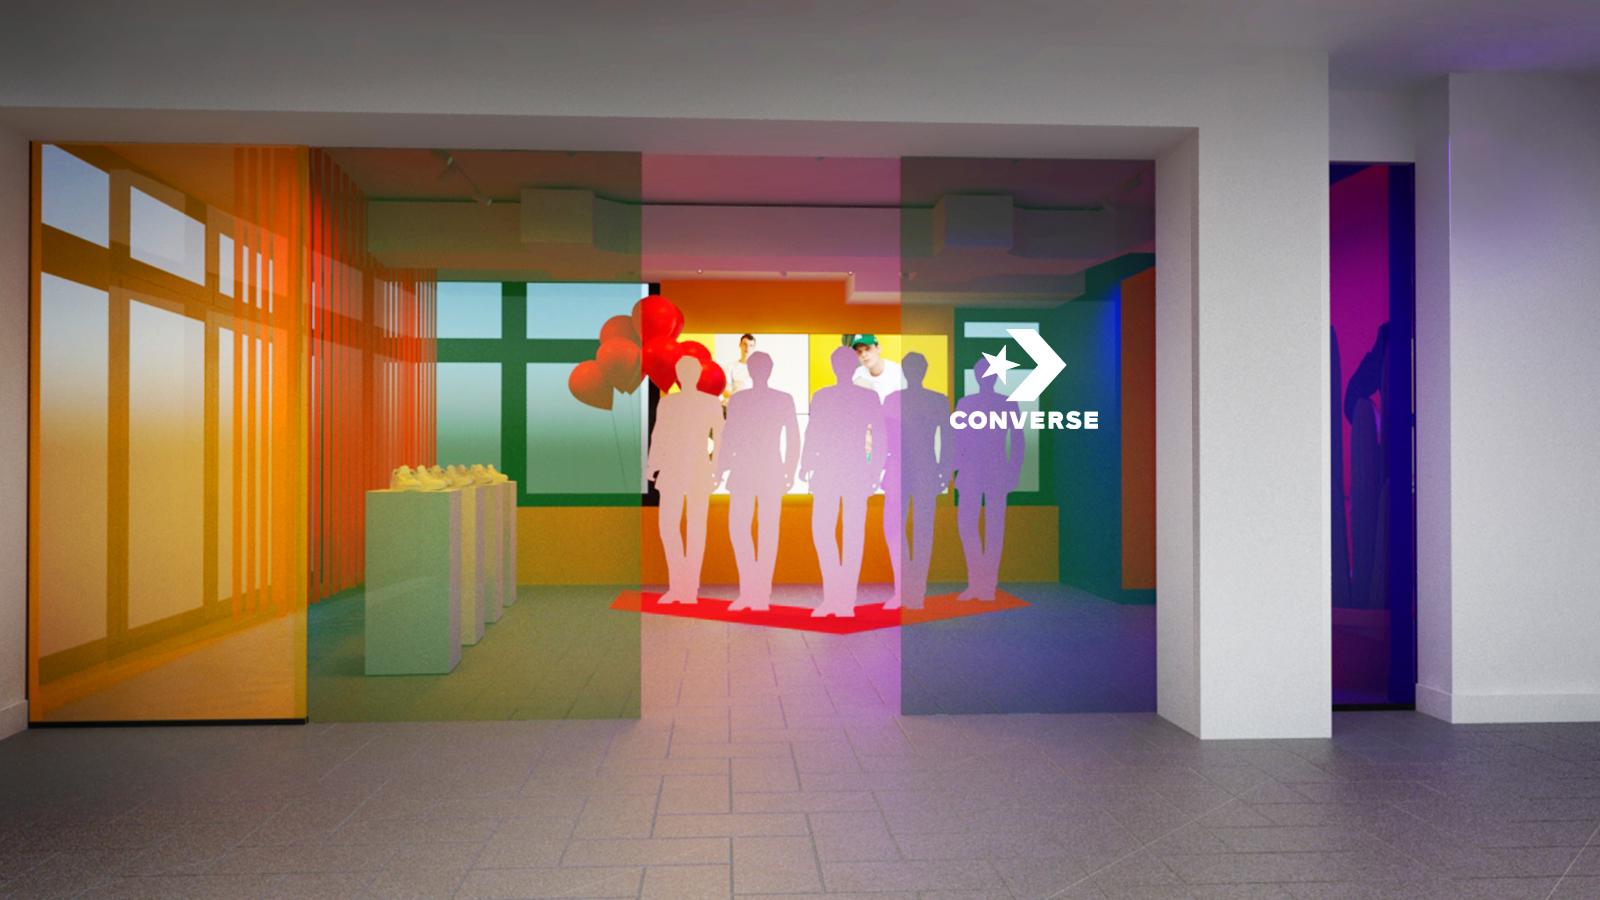 Kith_Converse_Onestar_v03_opt5_view03_v03.jpg